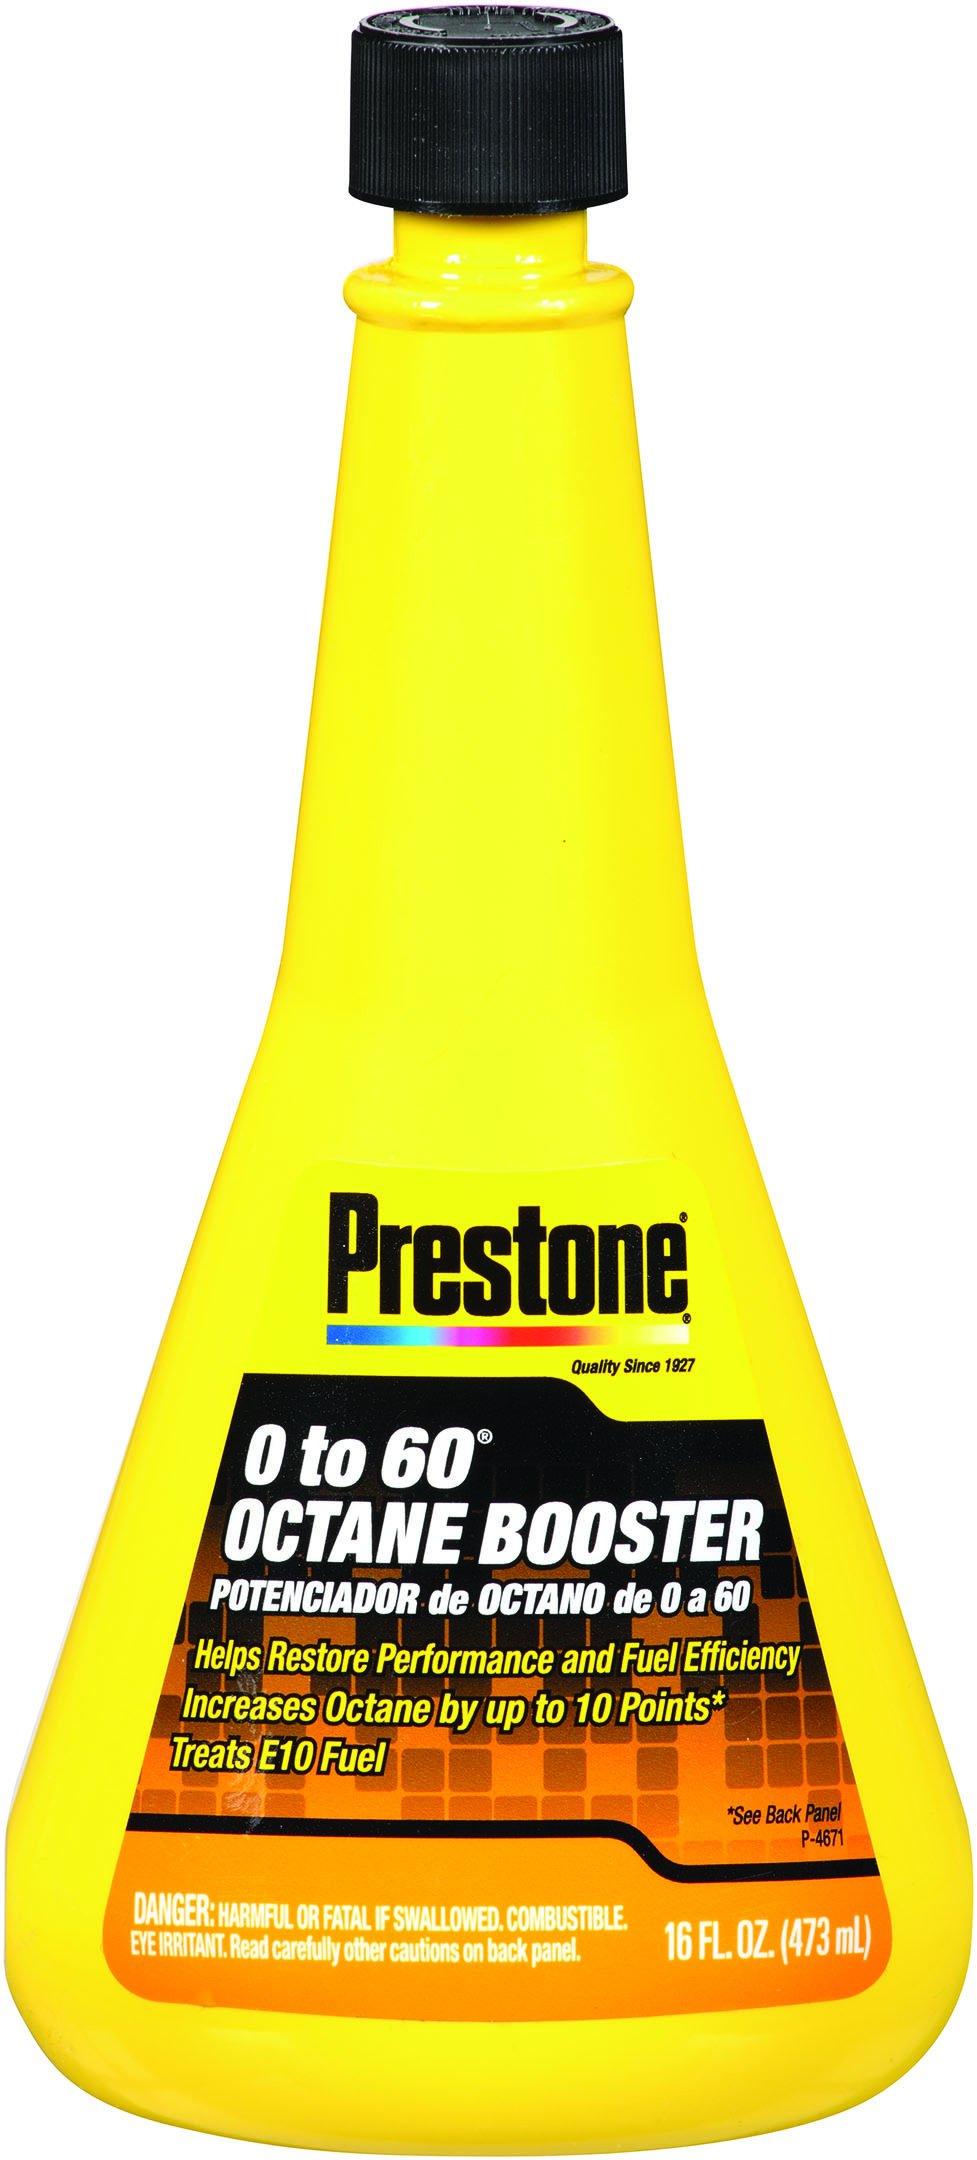 Prestone AS740-6PK 0-60 Octane Booster - 16 oz, (Pack of 6) by Prestone